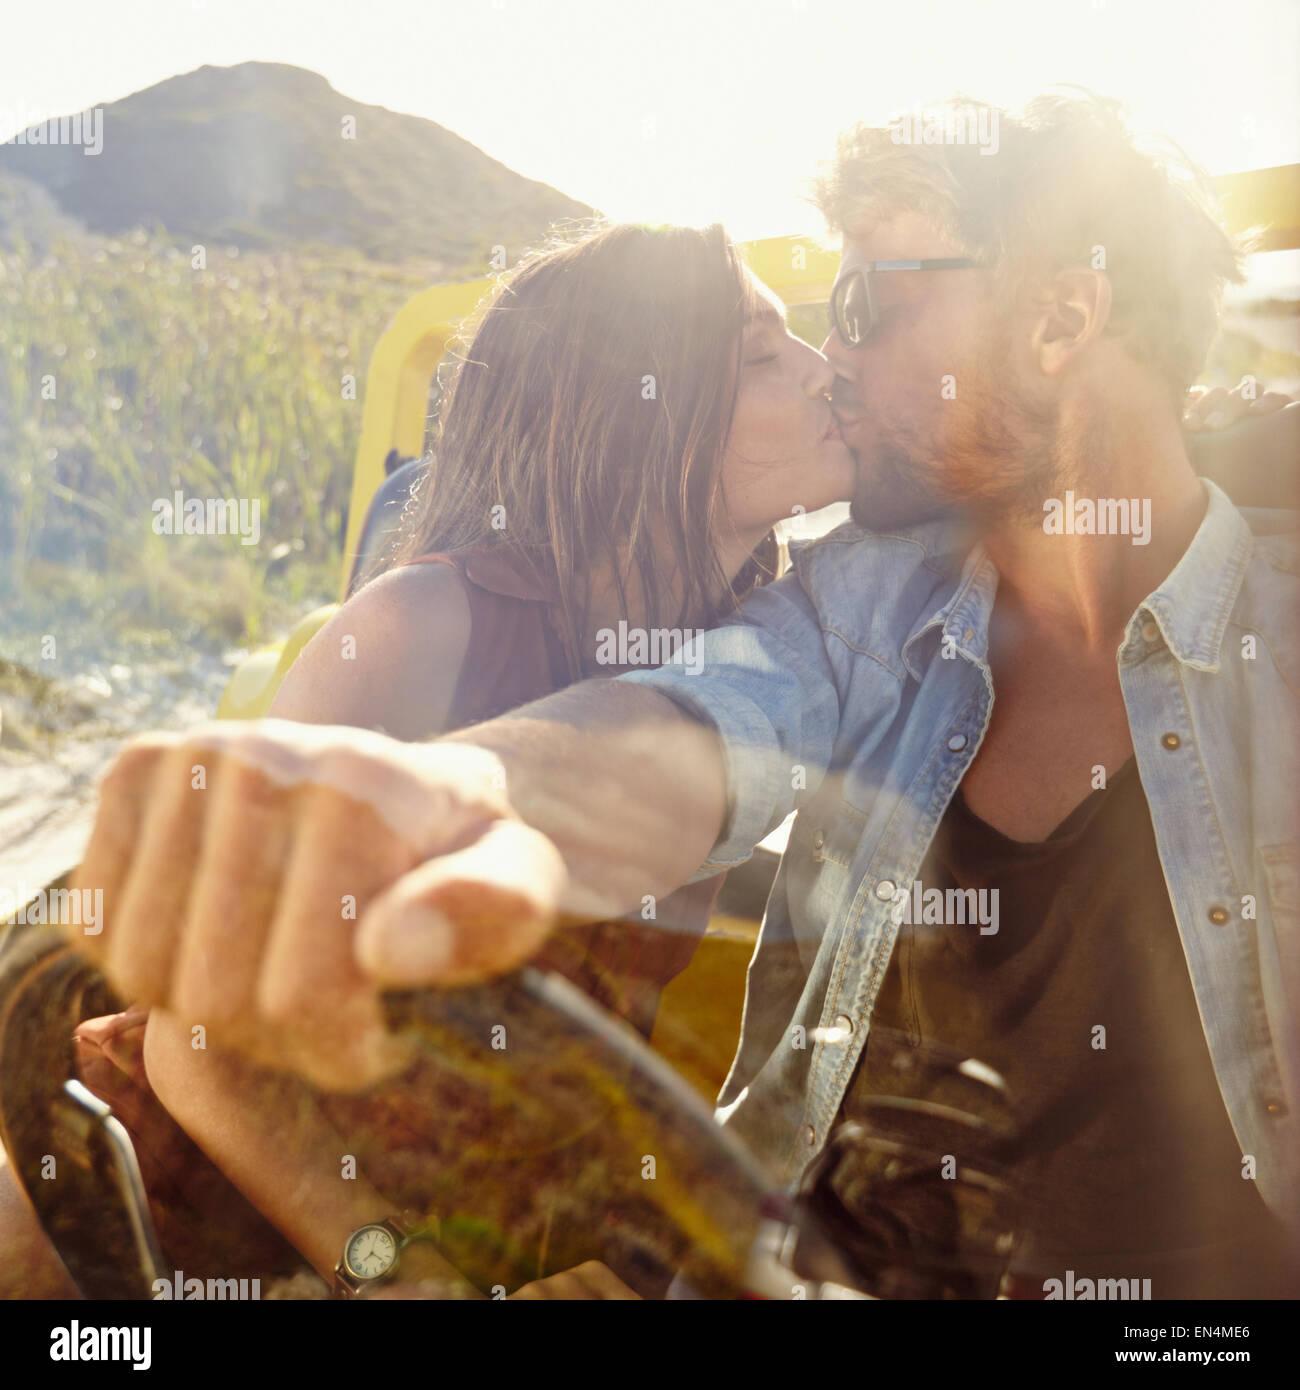 Joven pareja besándose en el coche. Pareja en amor en Road Trip a divertirse. Imagen De Stock